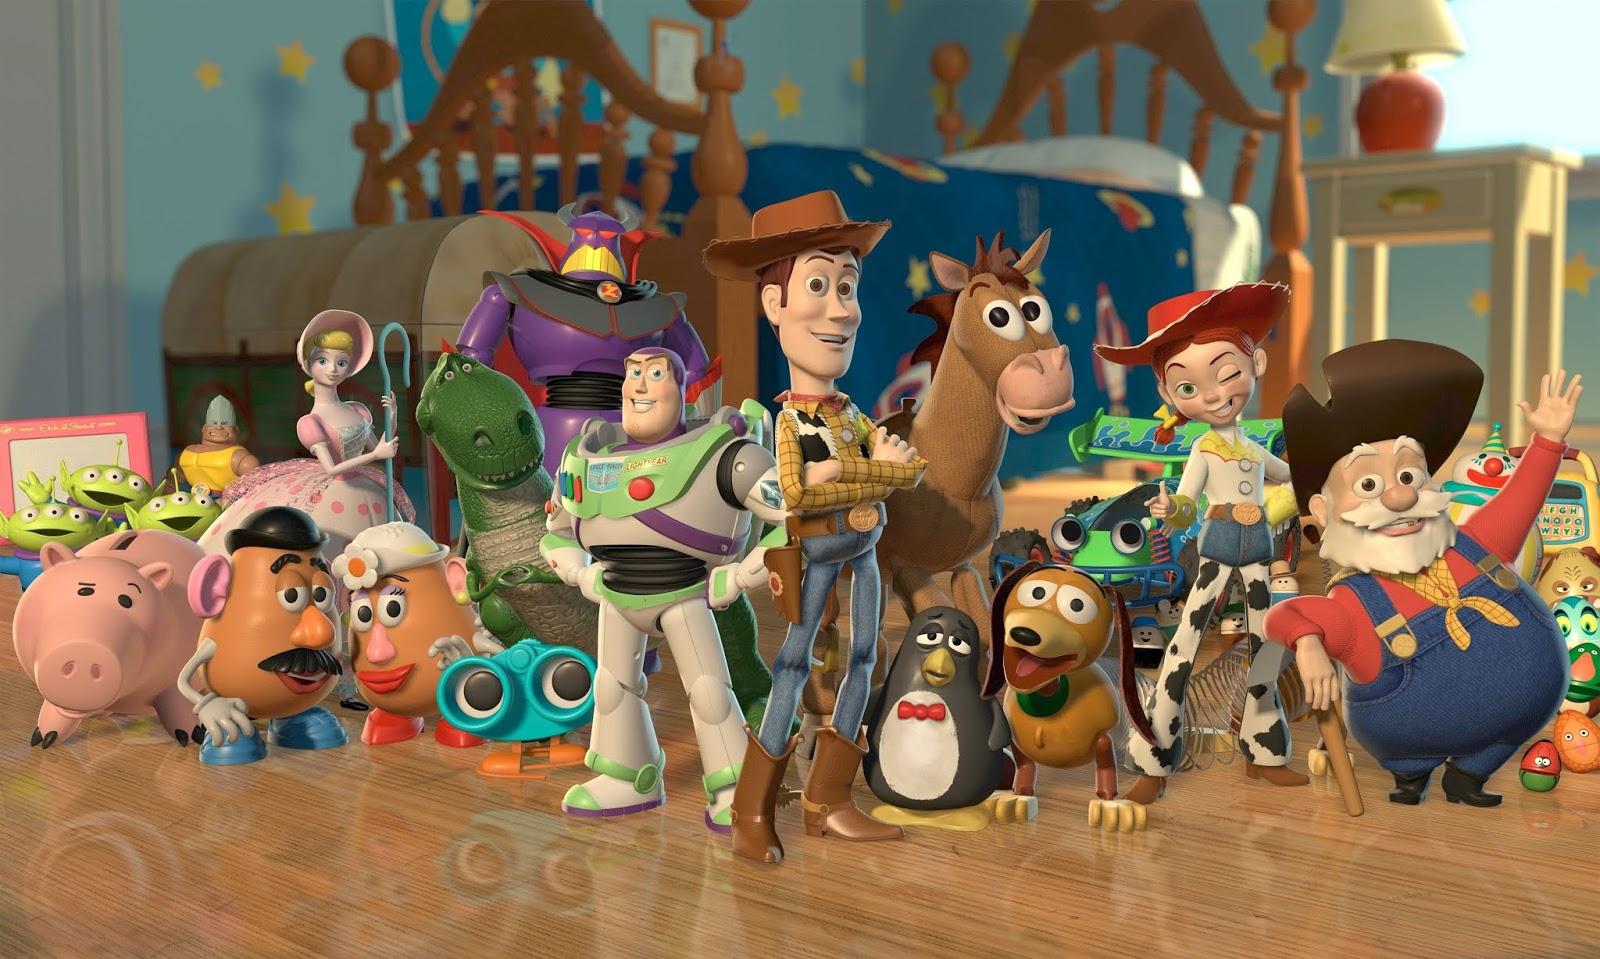 Toy Story (HD 720P y español Latino 1995) poster box code